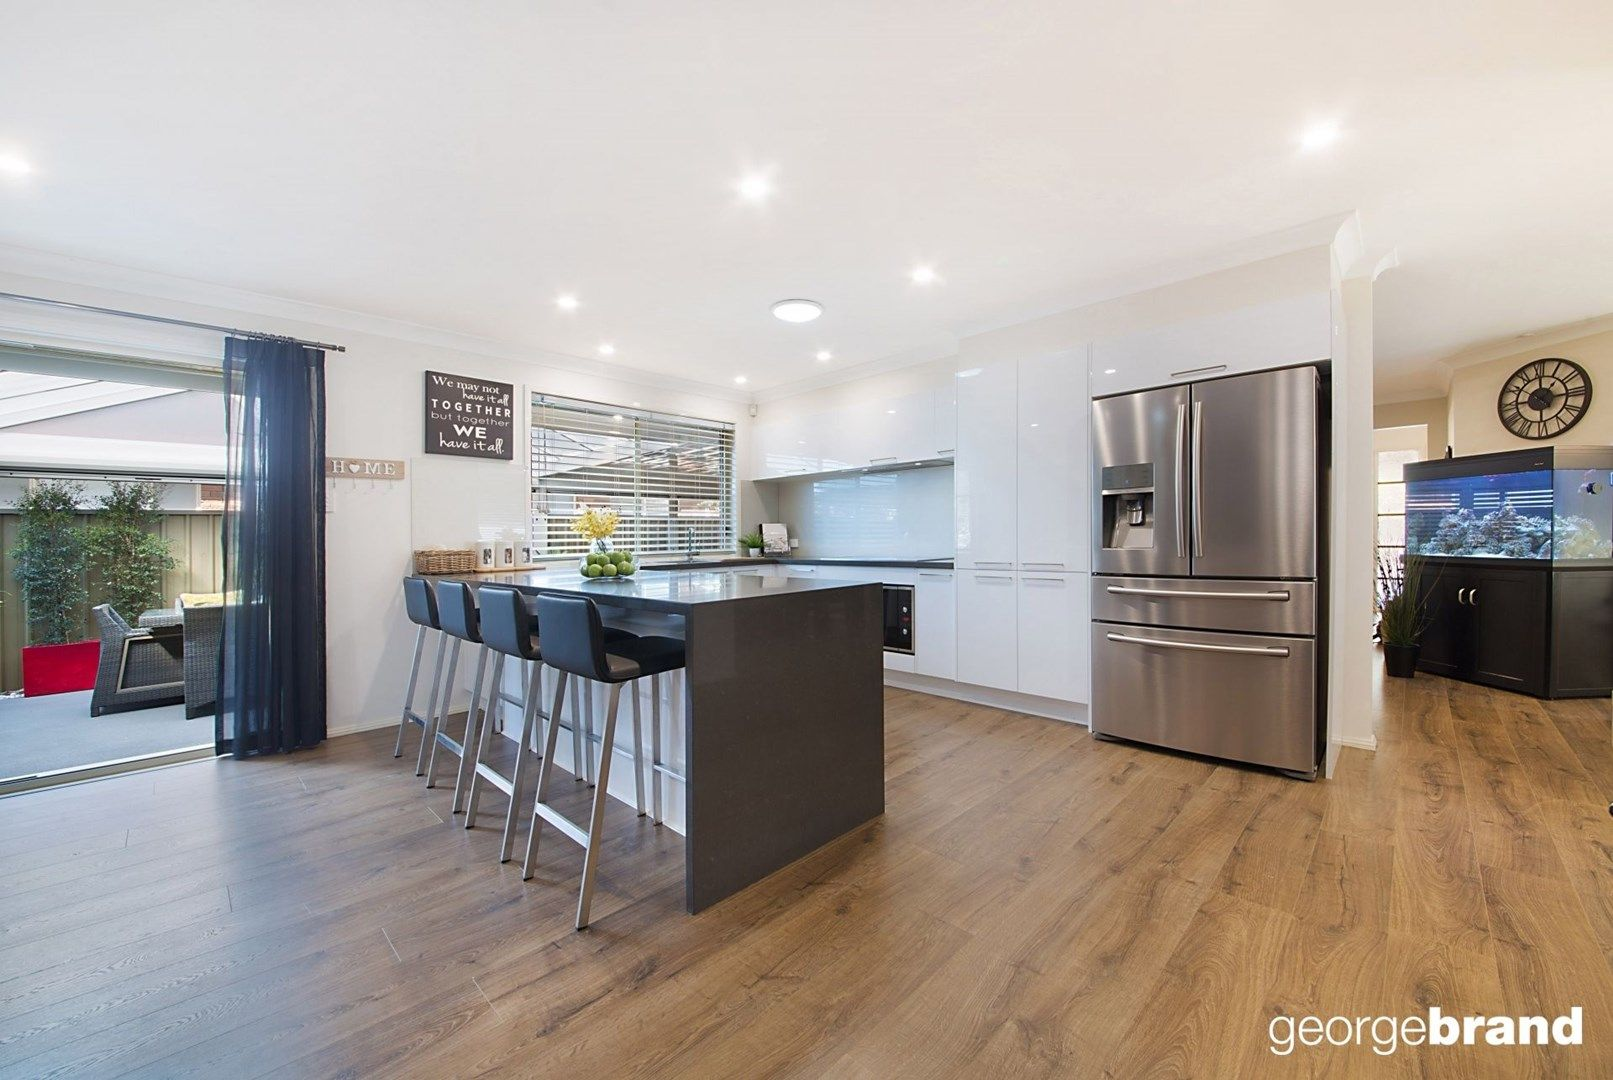 19 Yarram Rd, Bensville NSW 2251, Image 1